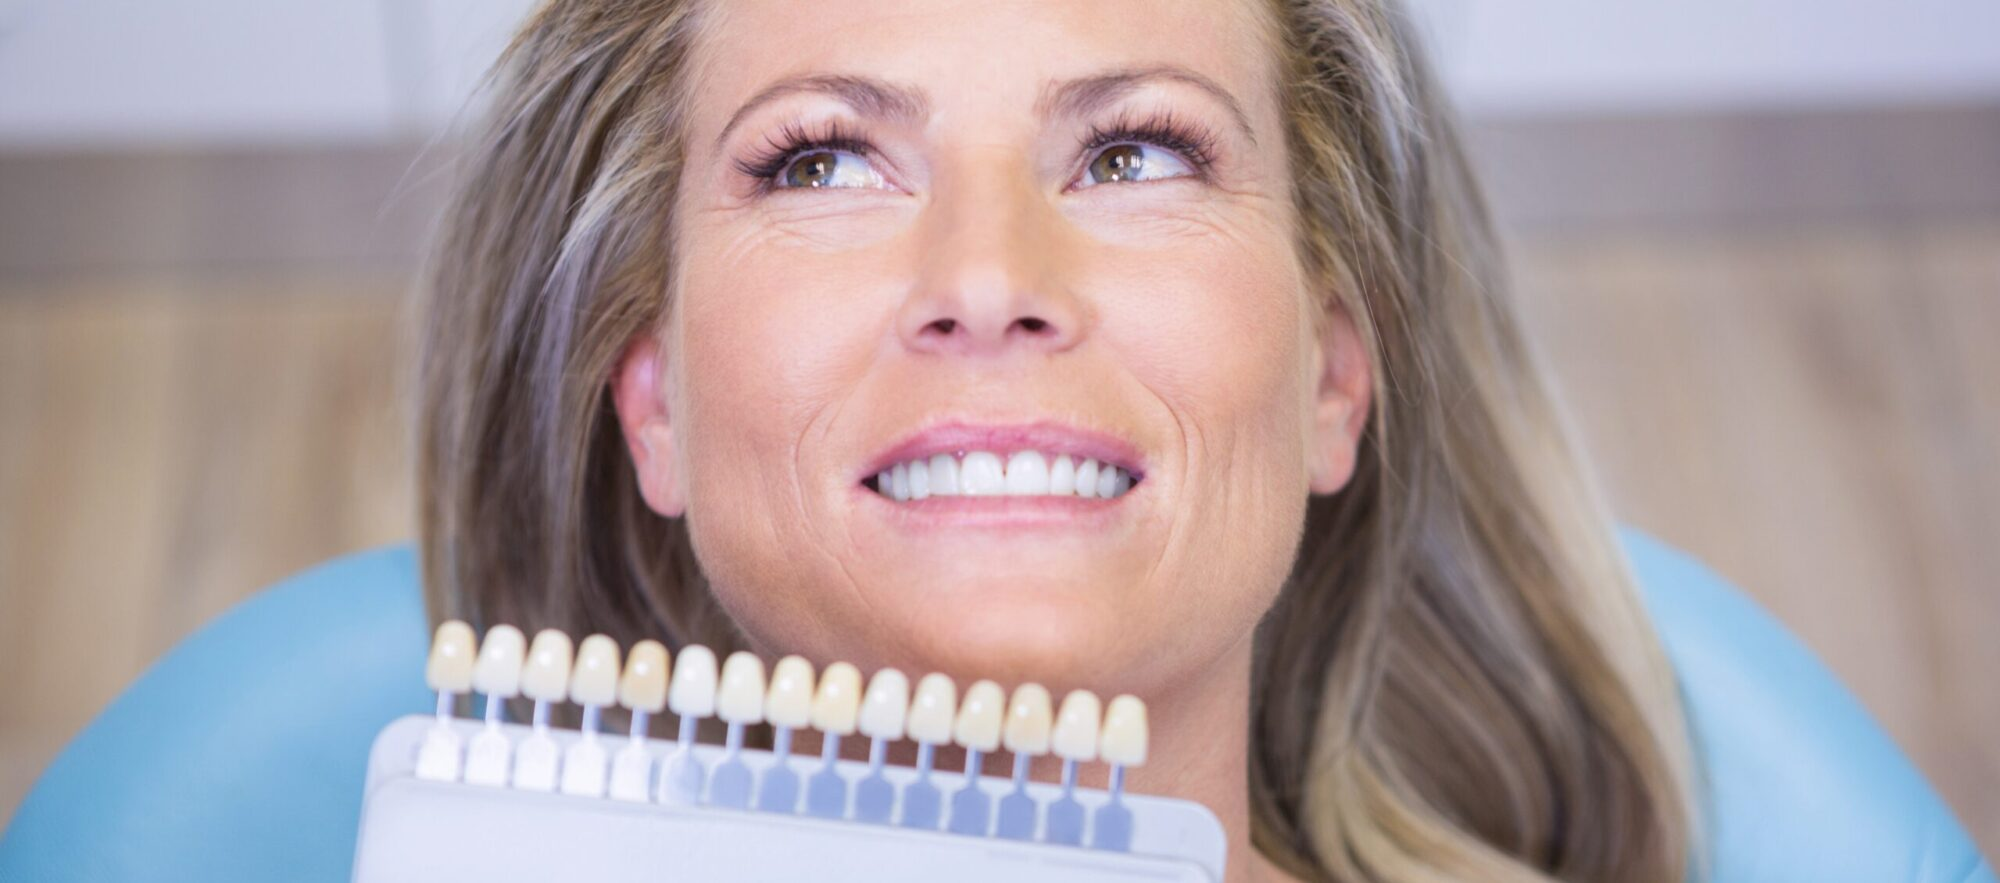 Dentinel Fogászati Klinika